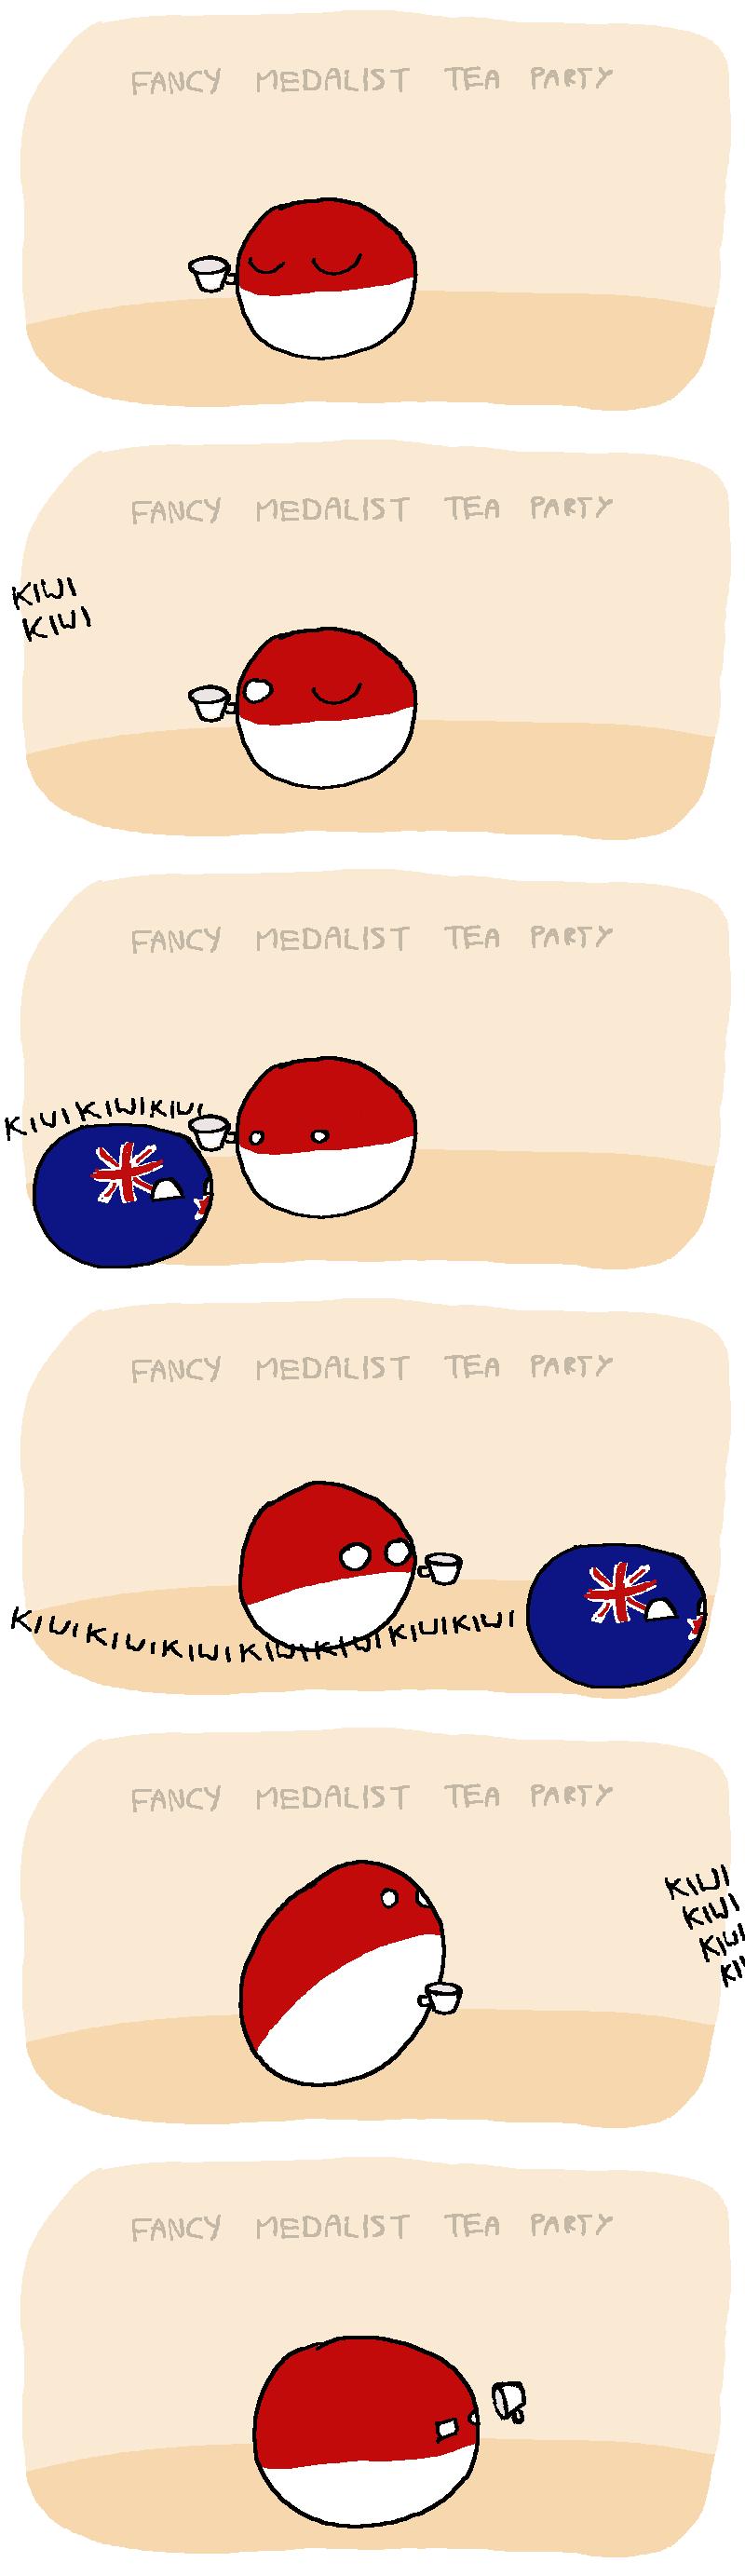 kiwikiwi.png